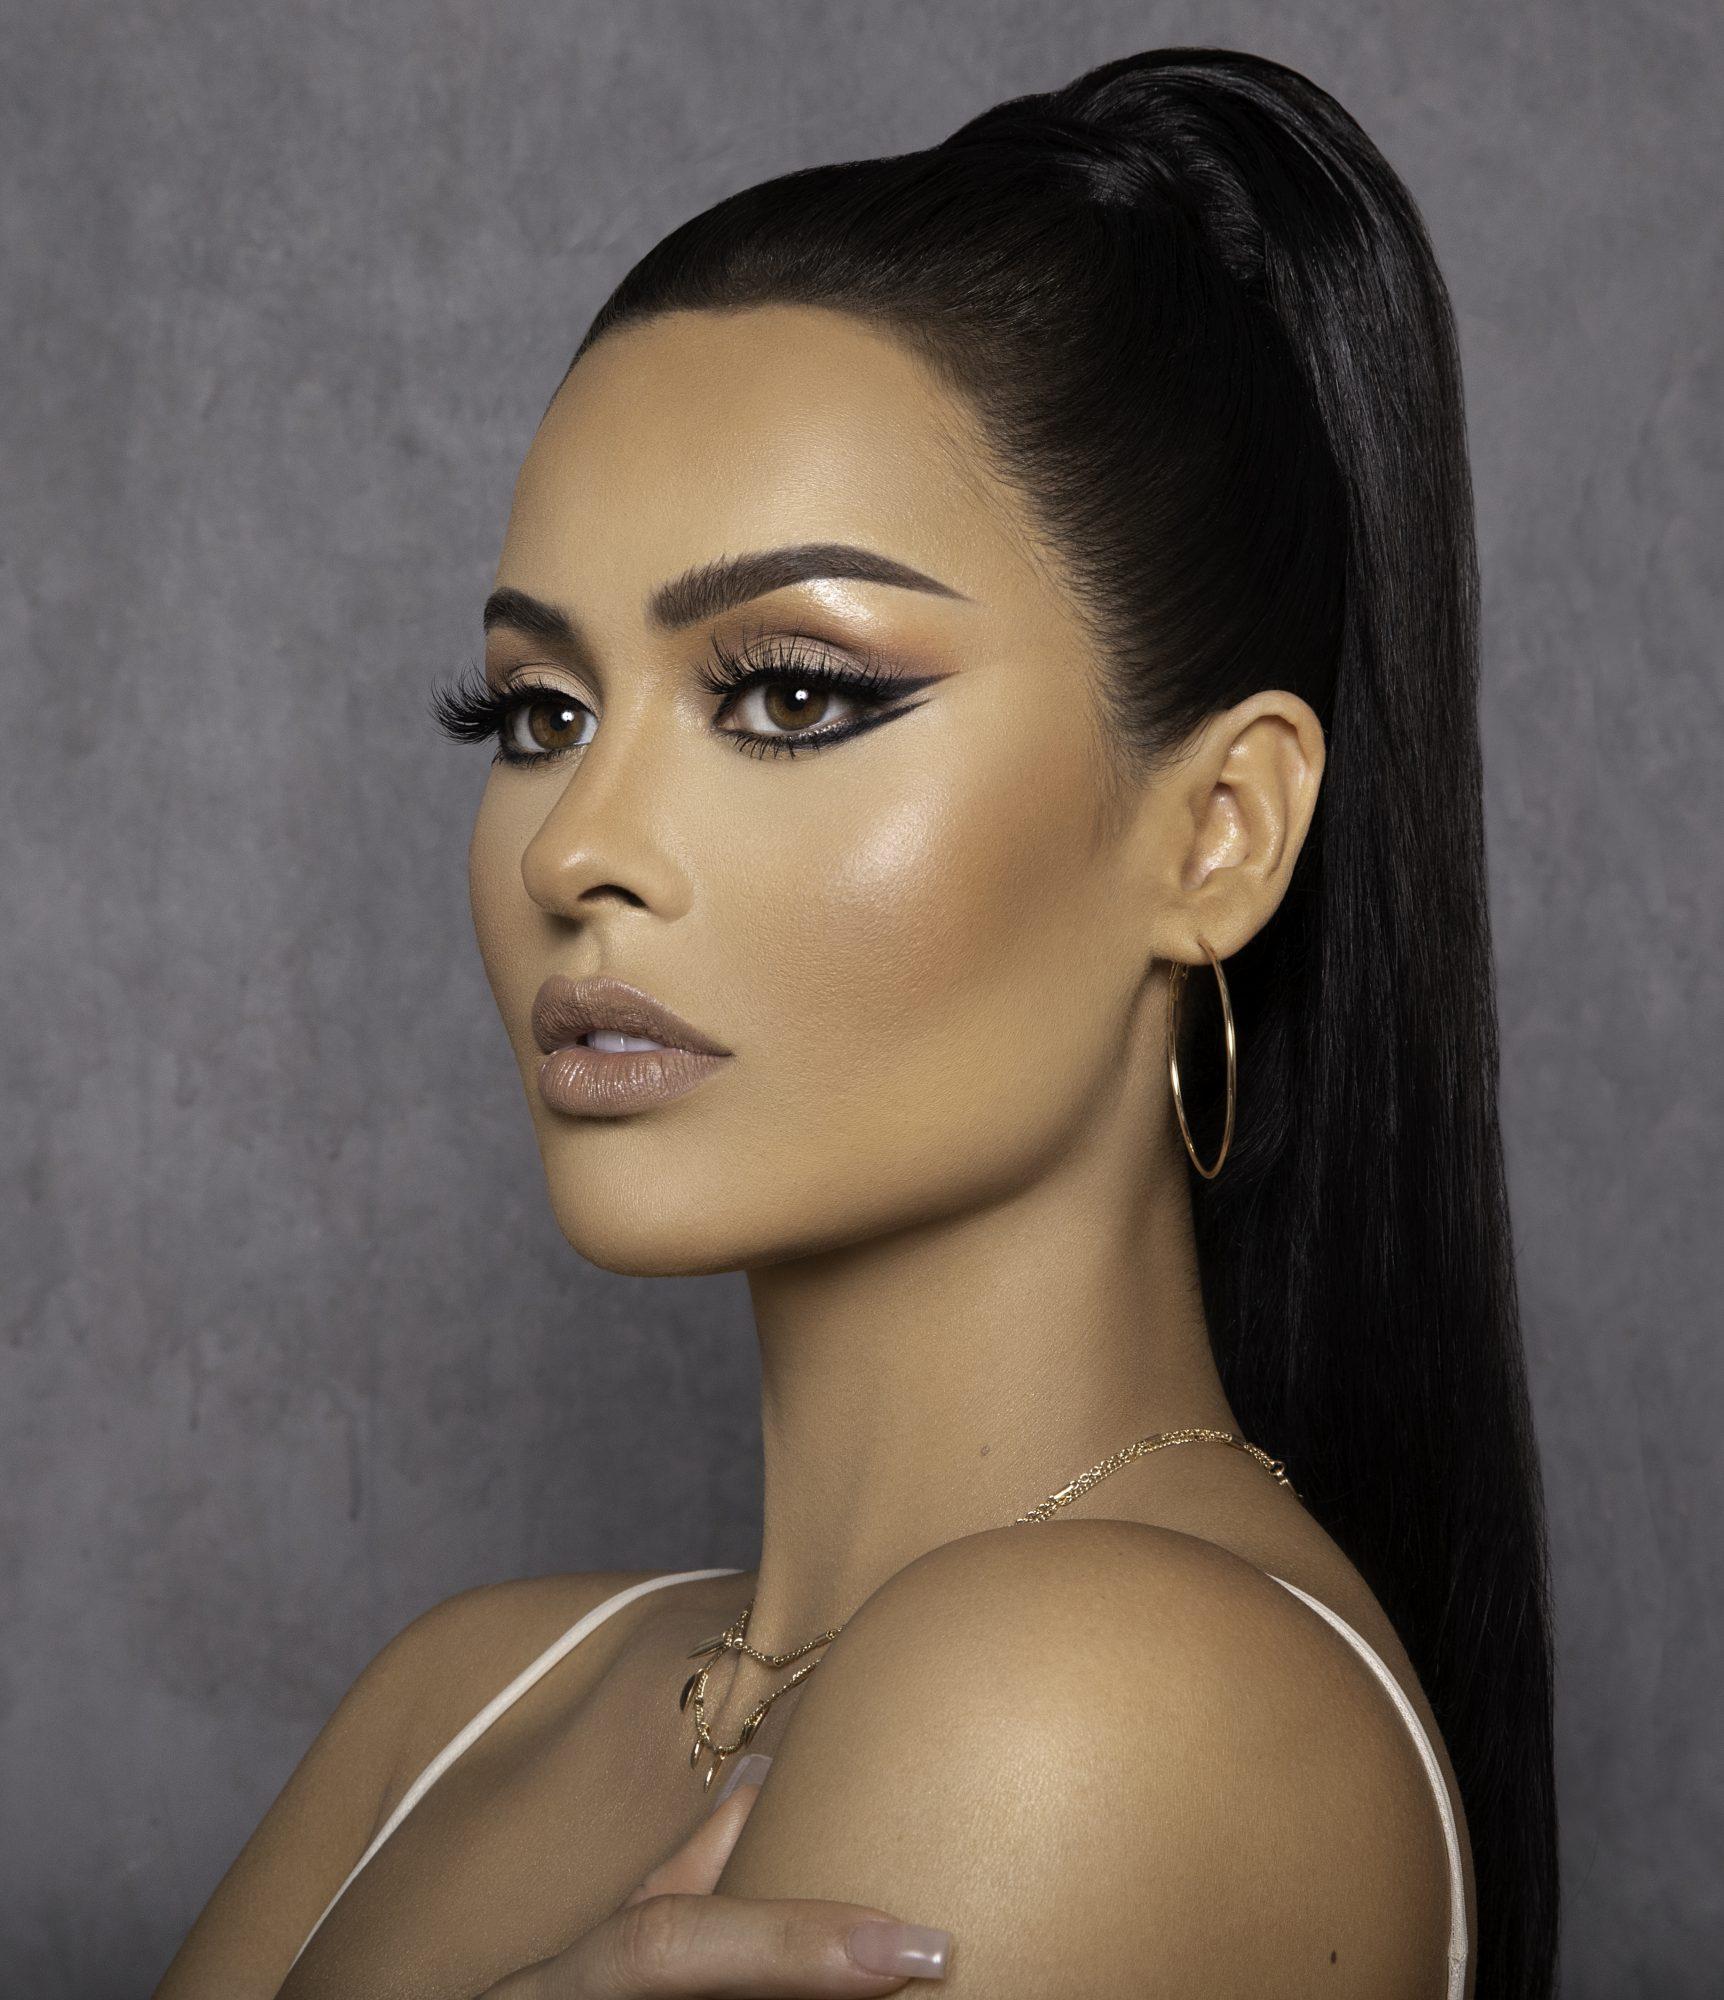 Latina social media star Christen Dominique is empowering women through makeup